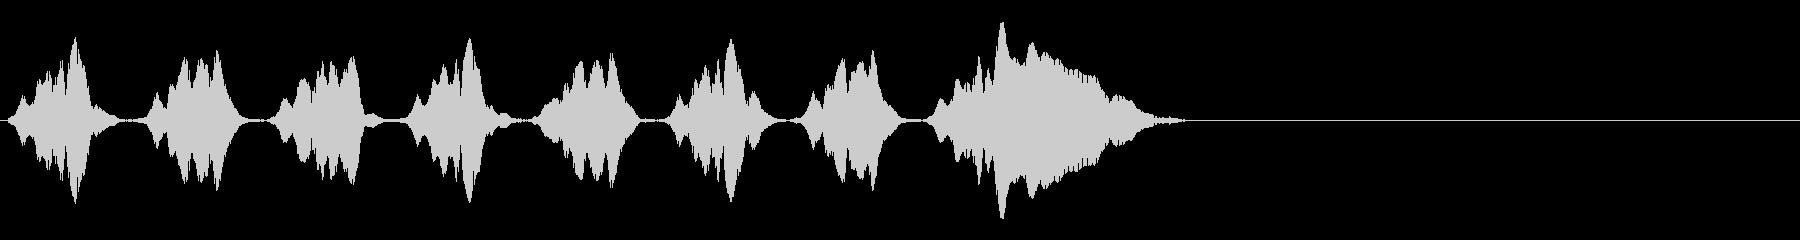 KANニャニャニャ自主規制音4shortの未再生の波形